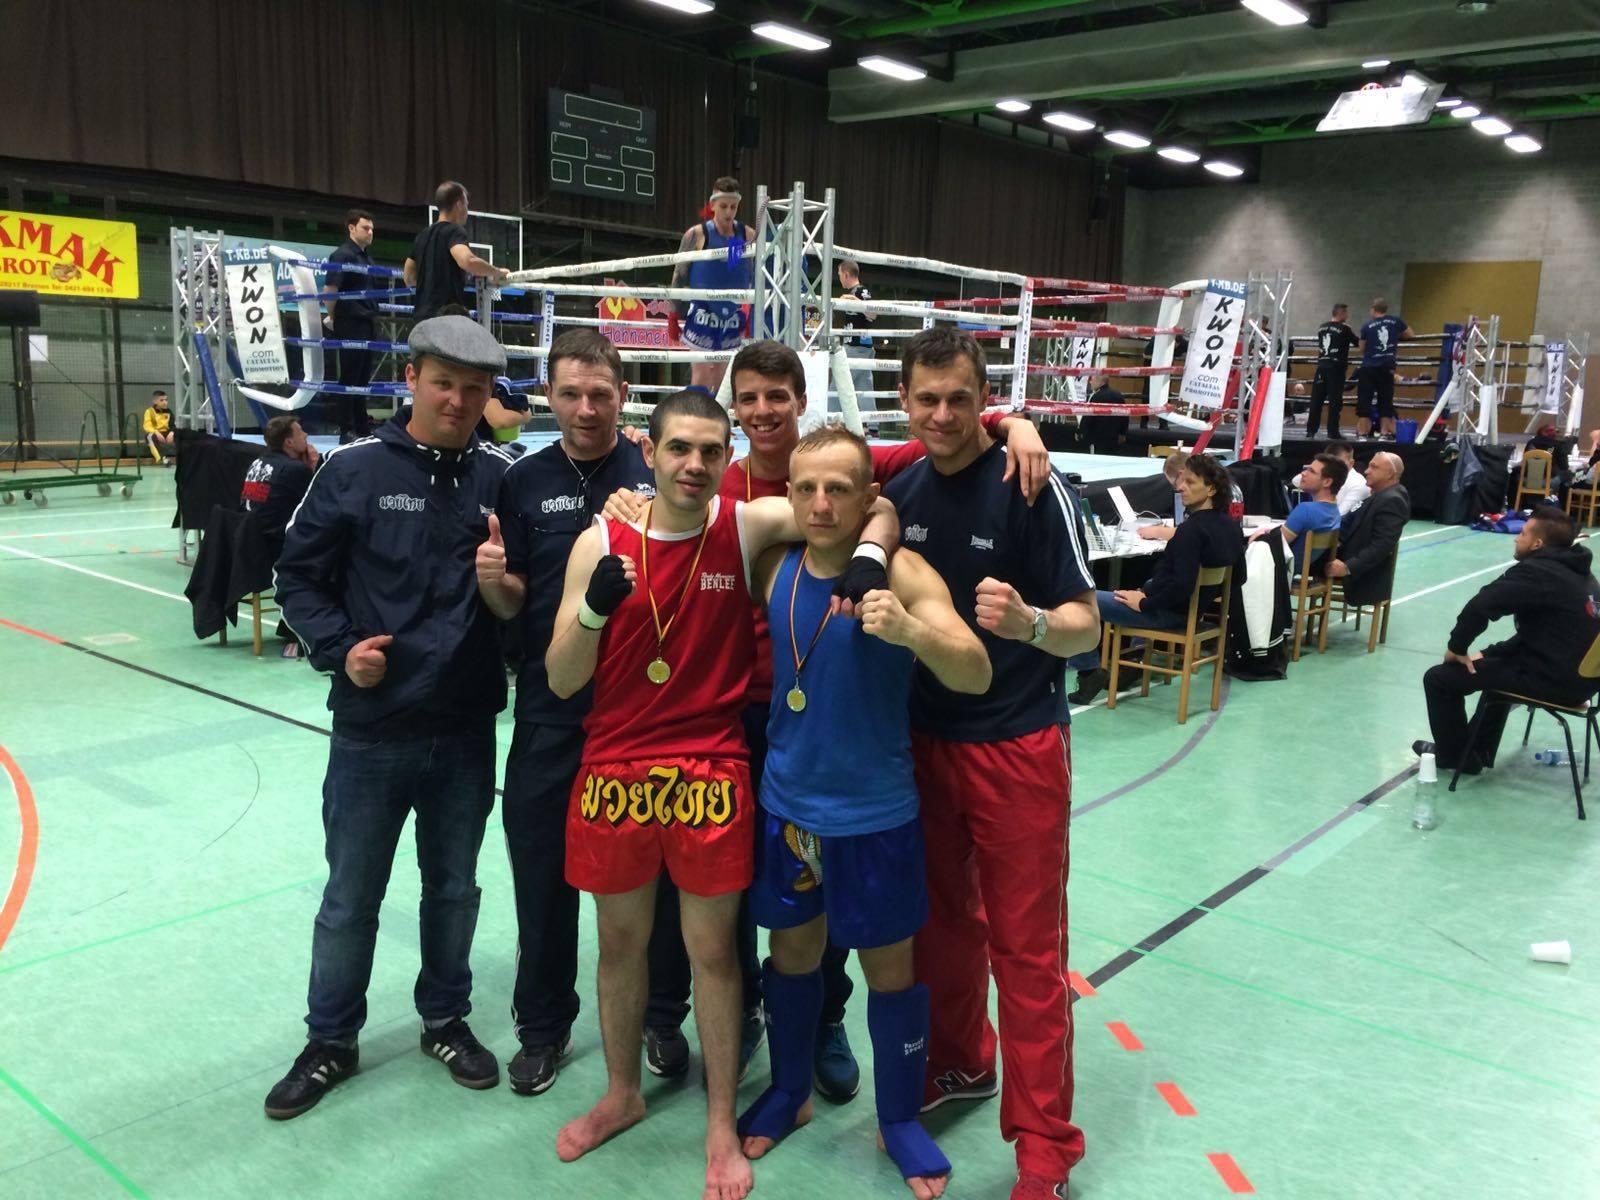 Kampfklub-tvg in der Wettkampfhalle